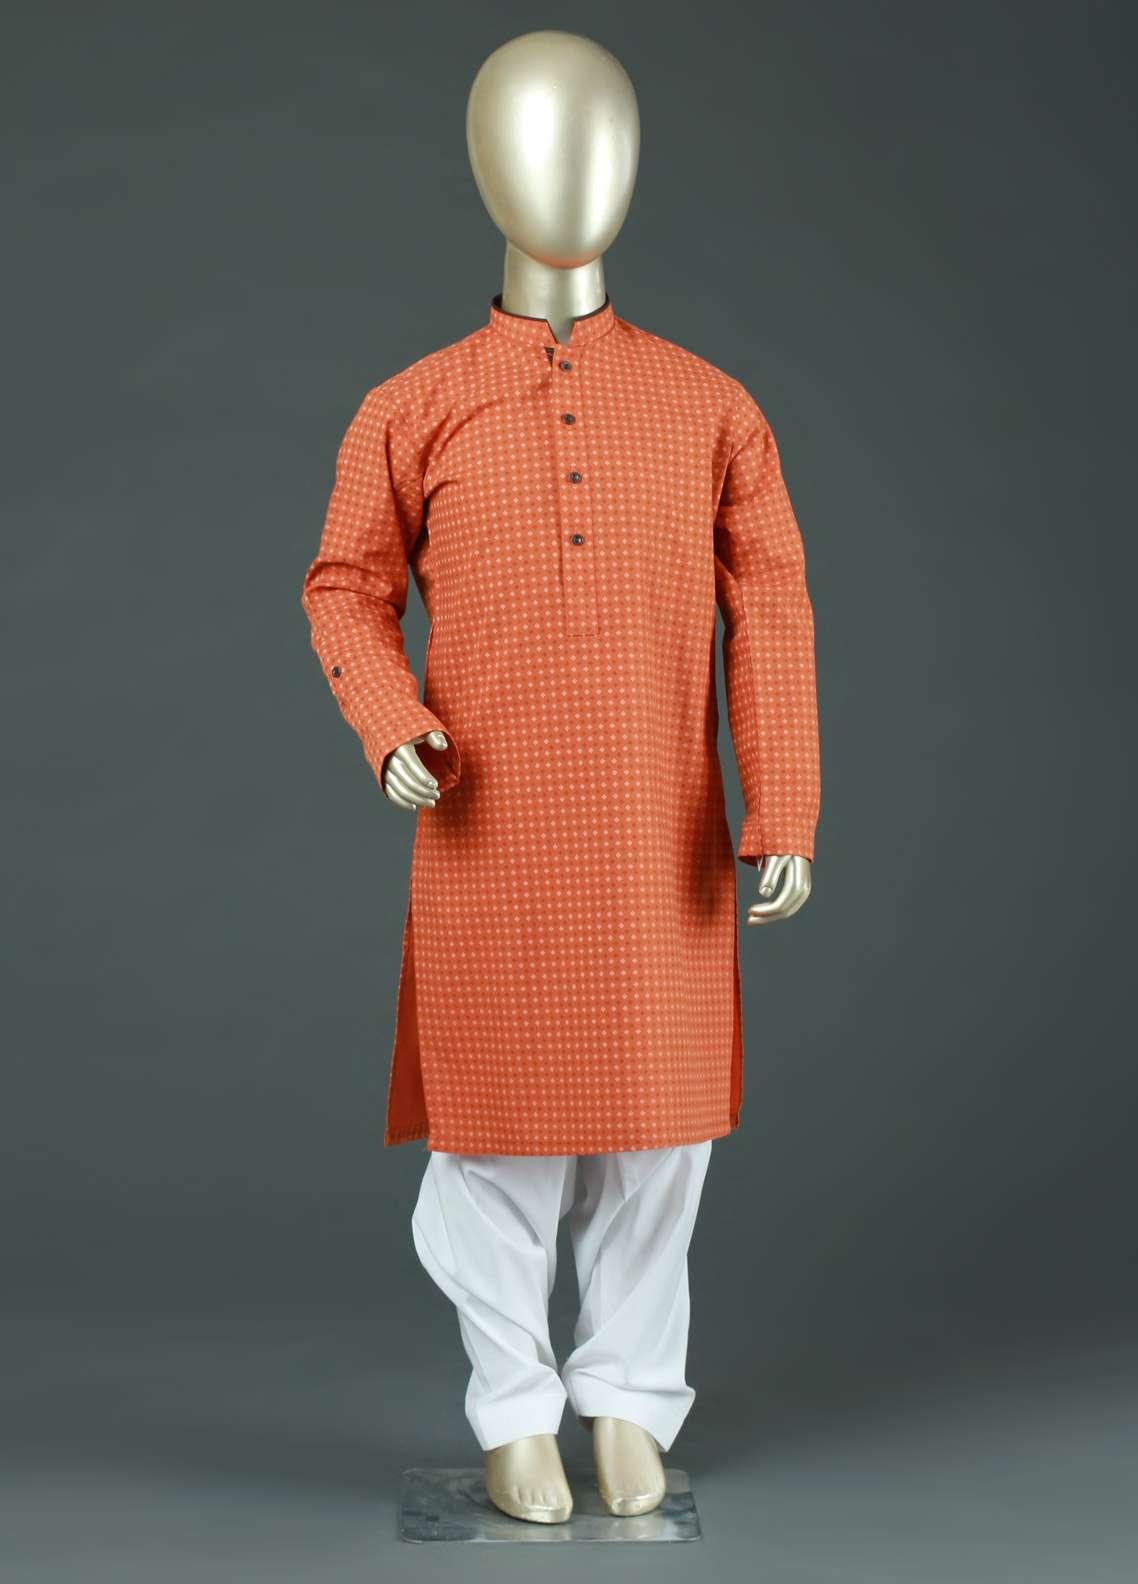 Aizaz Zafar Cotton Formal Kurtas for Boys -  AZ19B 220 Orange